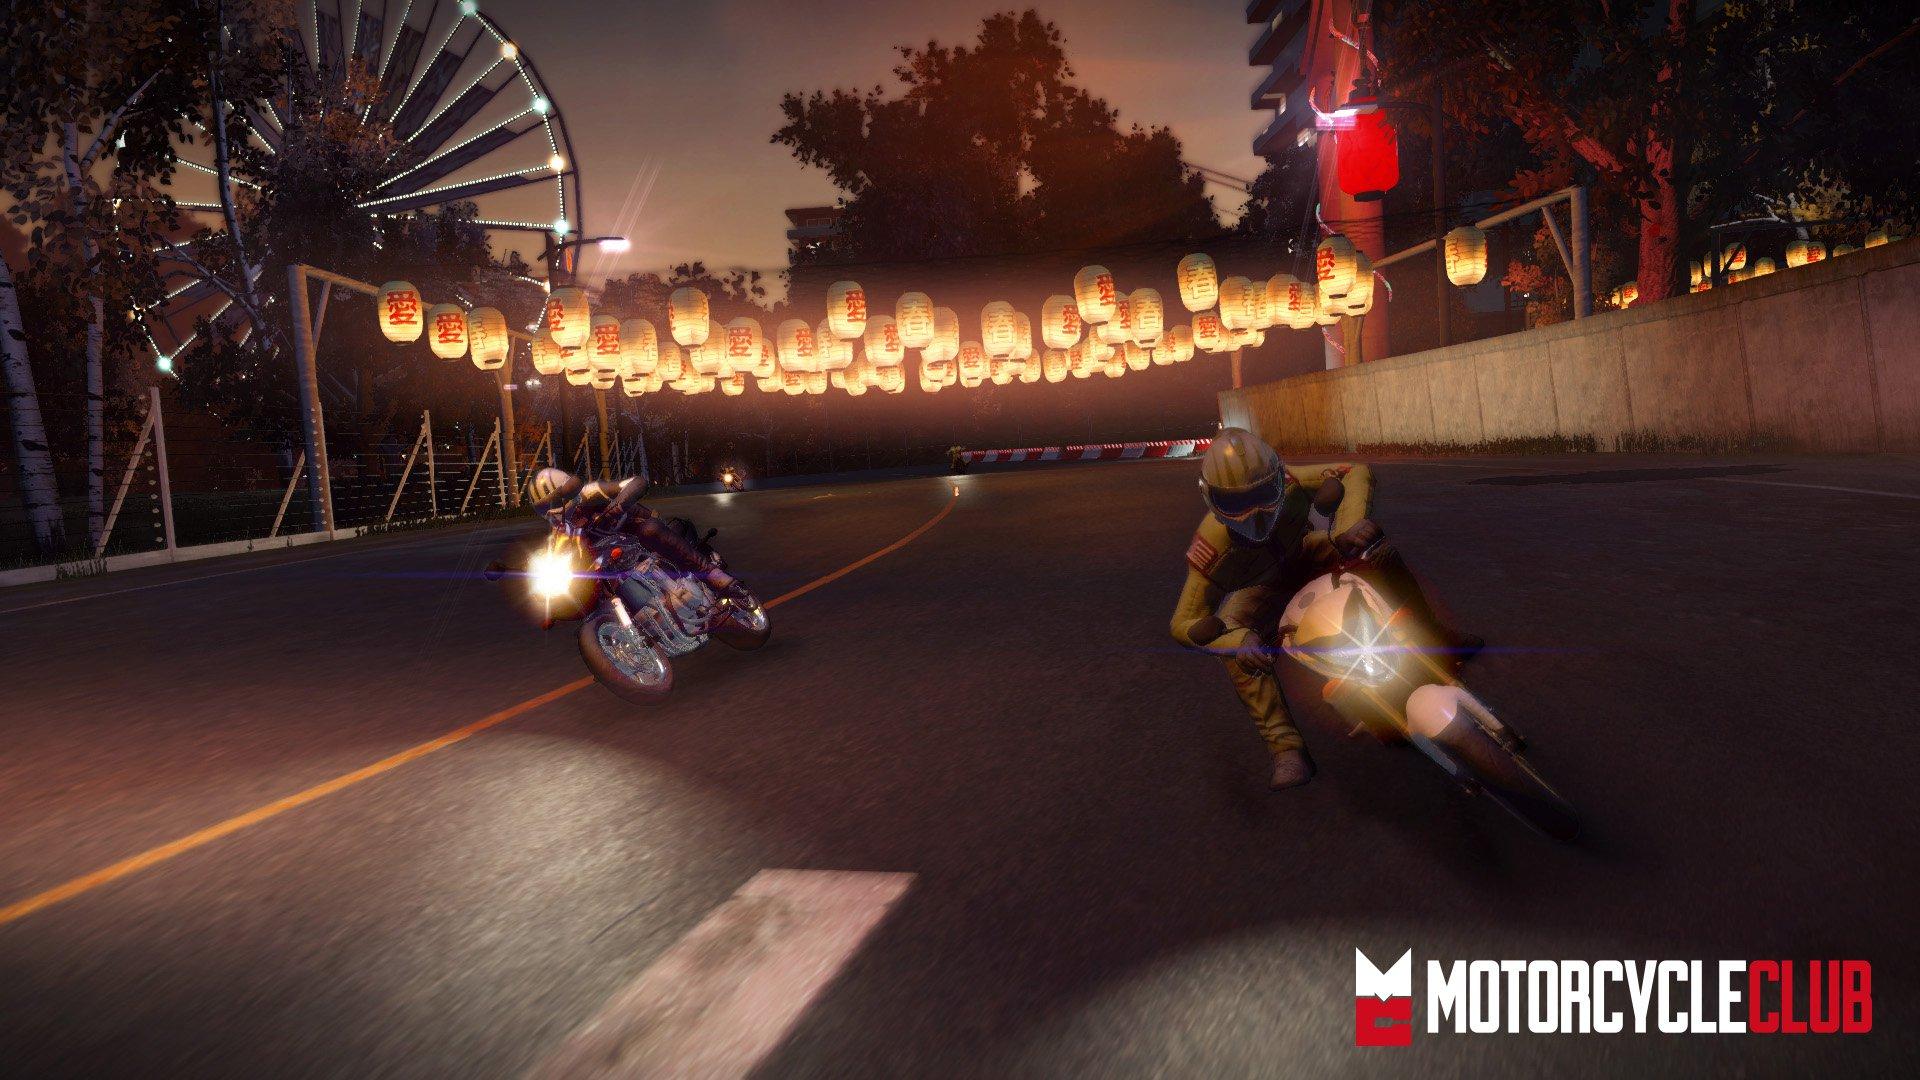 Motorcycle Club 3